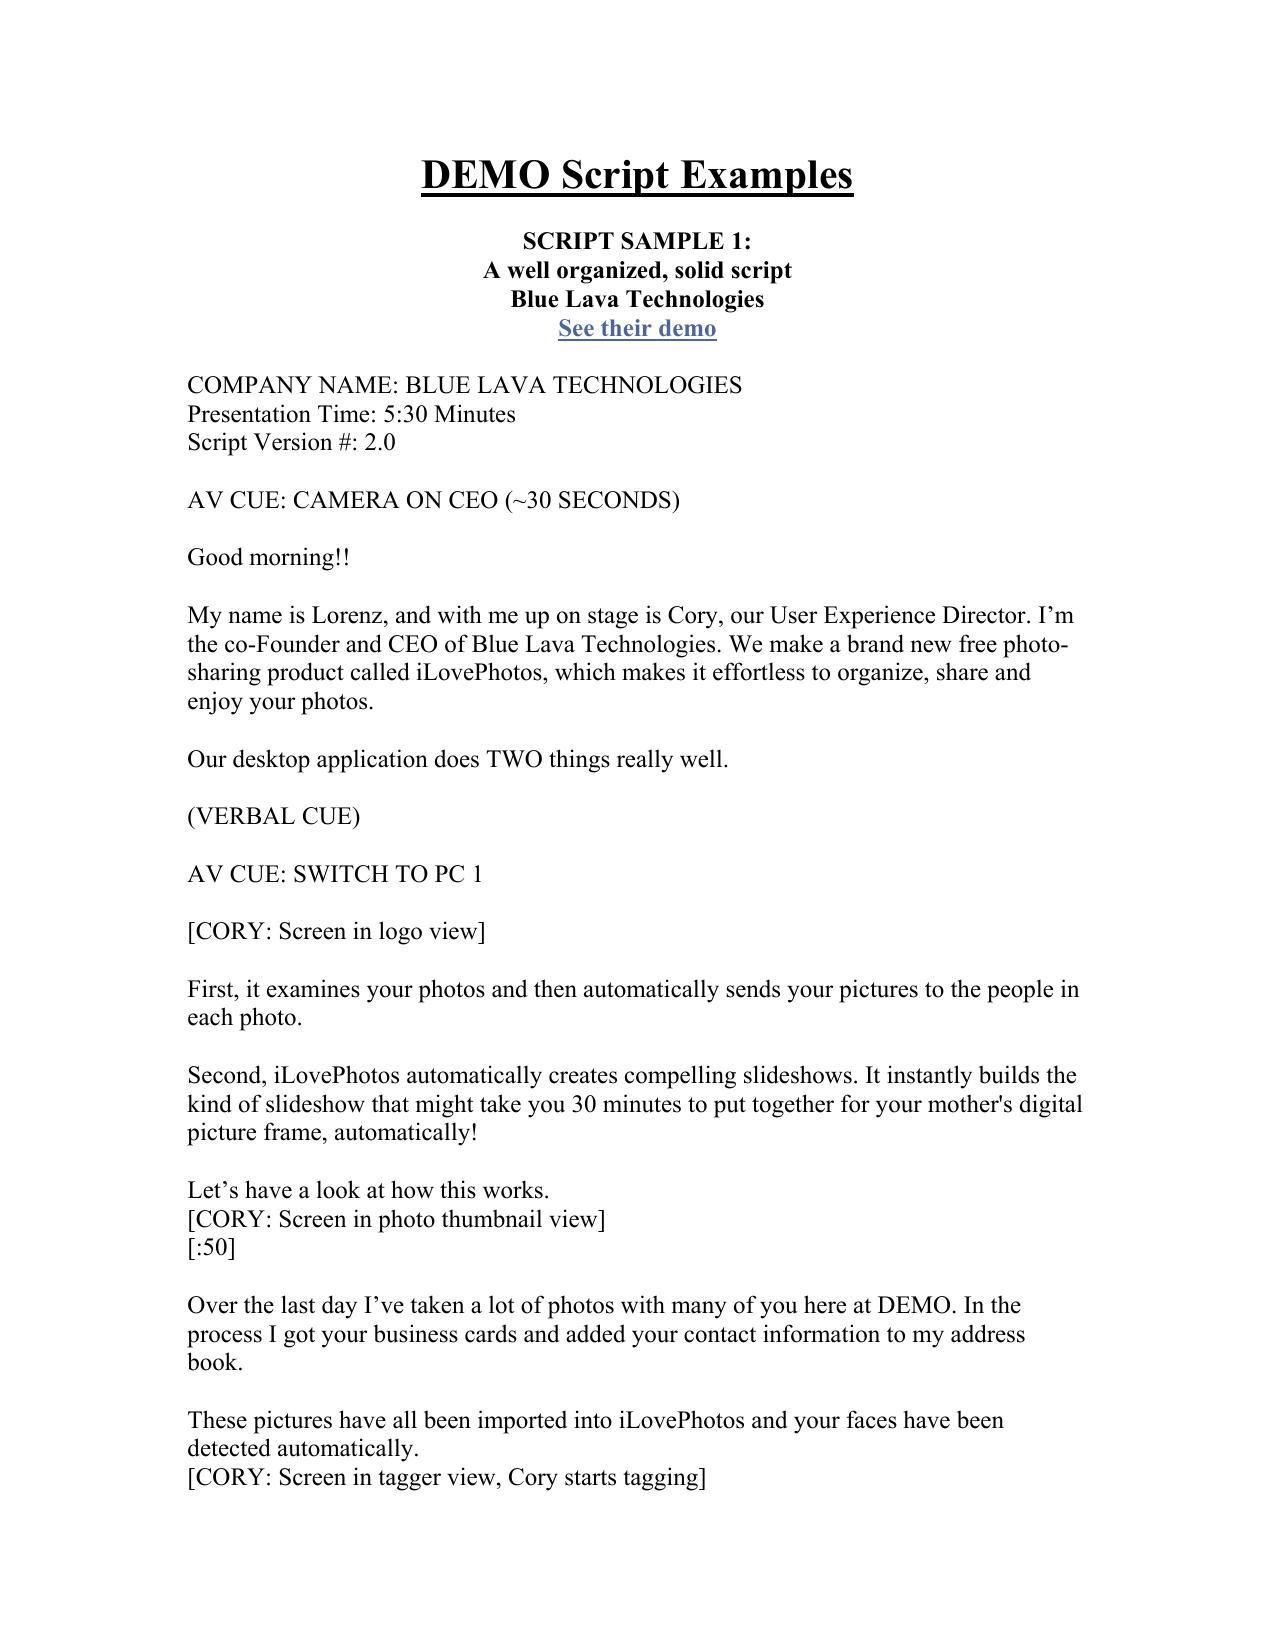 DEMO Script Examples SCRIPT SAMPLE 1 | manualzz com